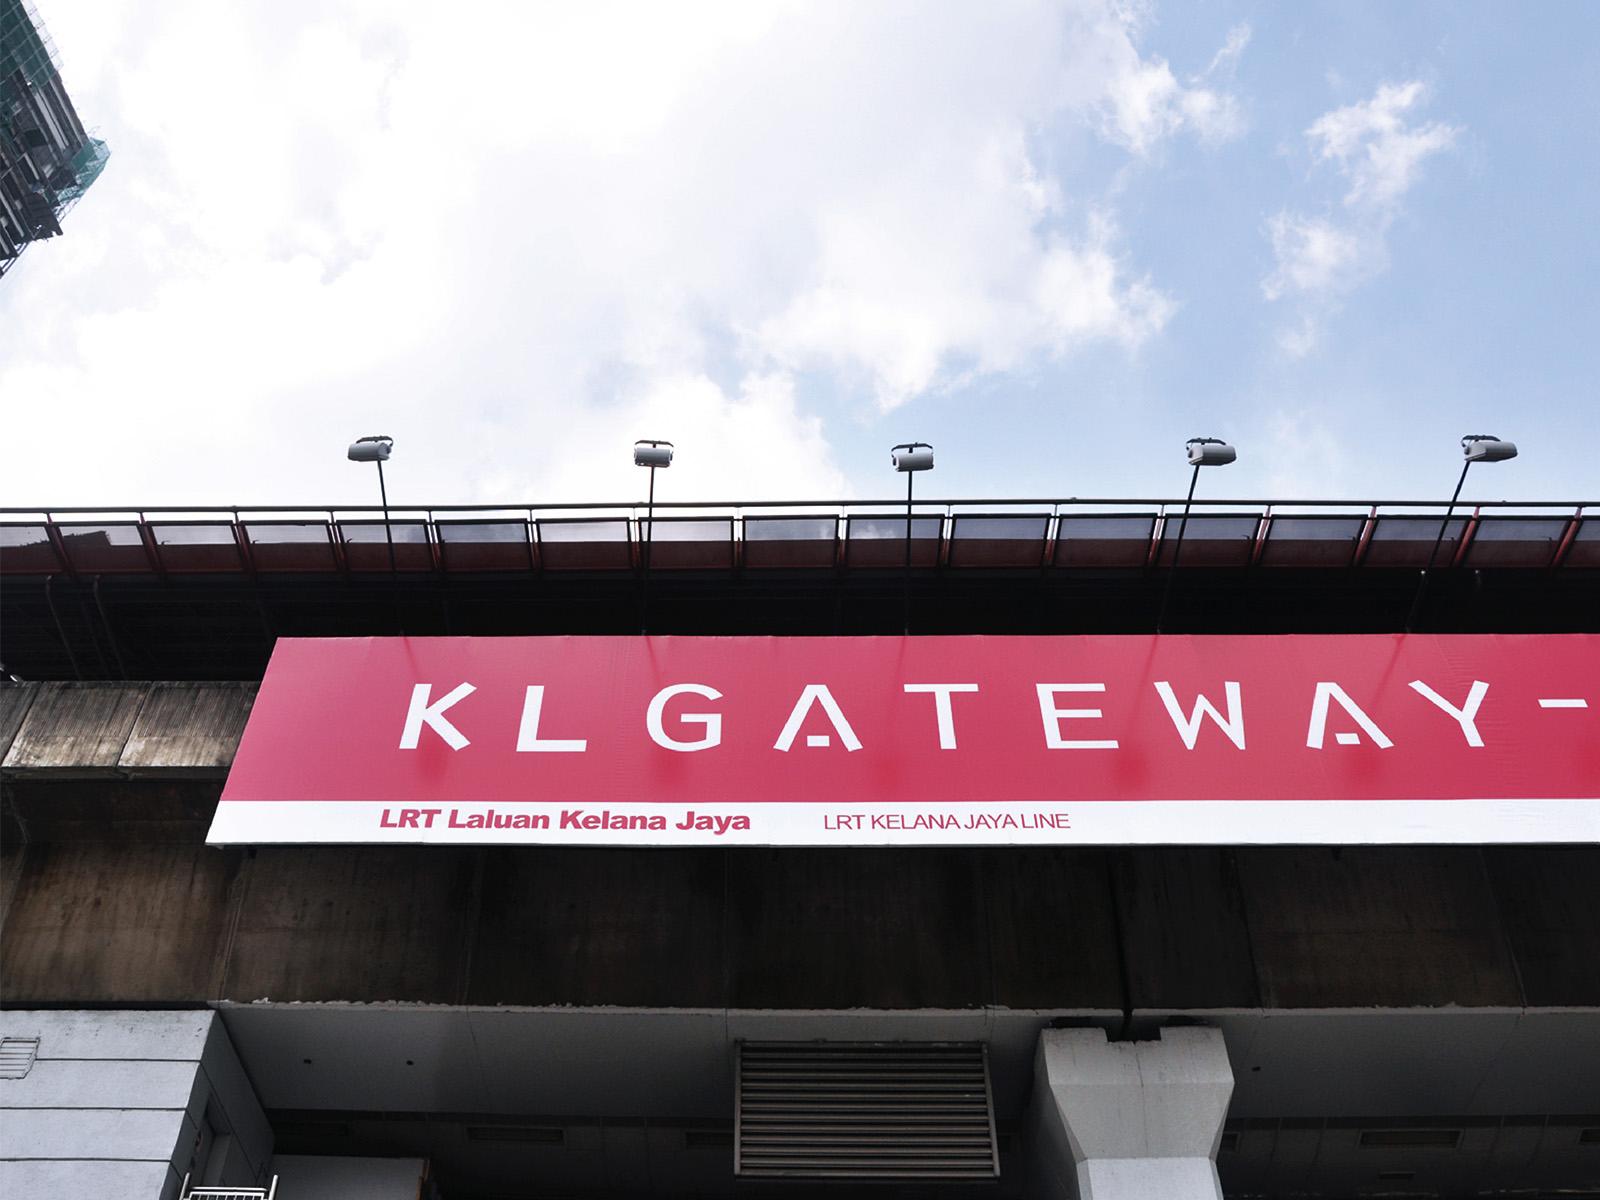 KL Gateway by Suezcap train station brand advertisement takeover and name change to KL Gateway - Universiti signage